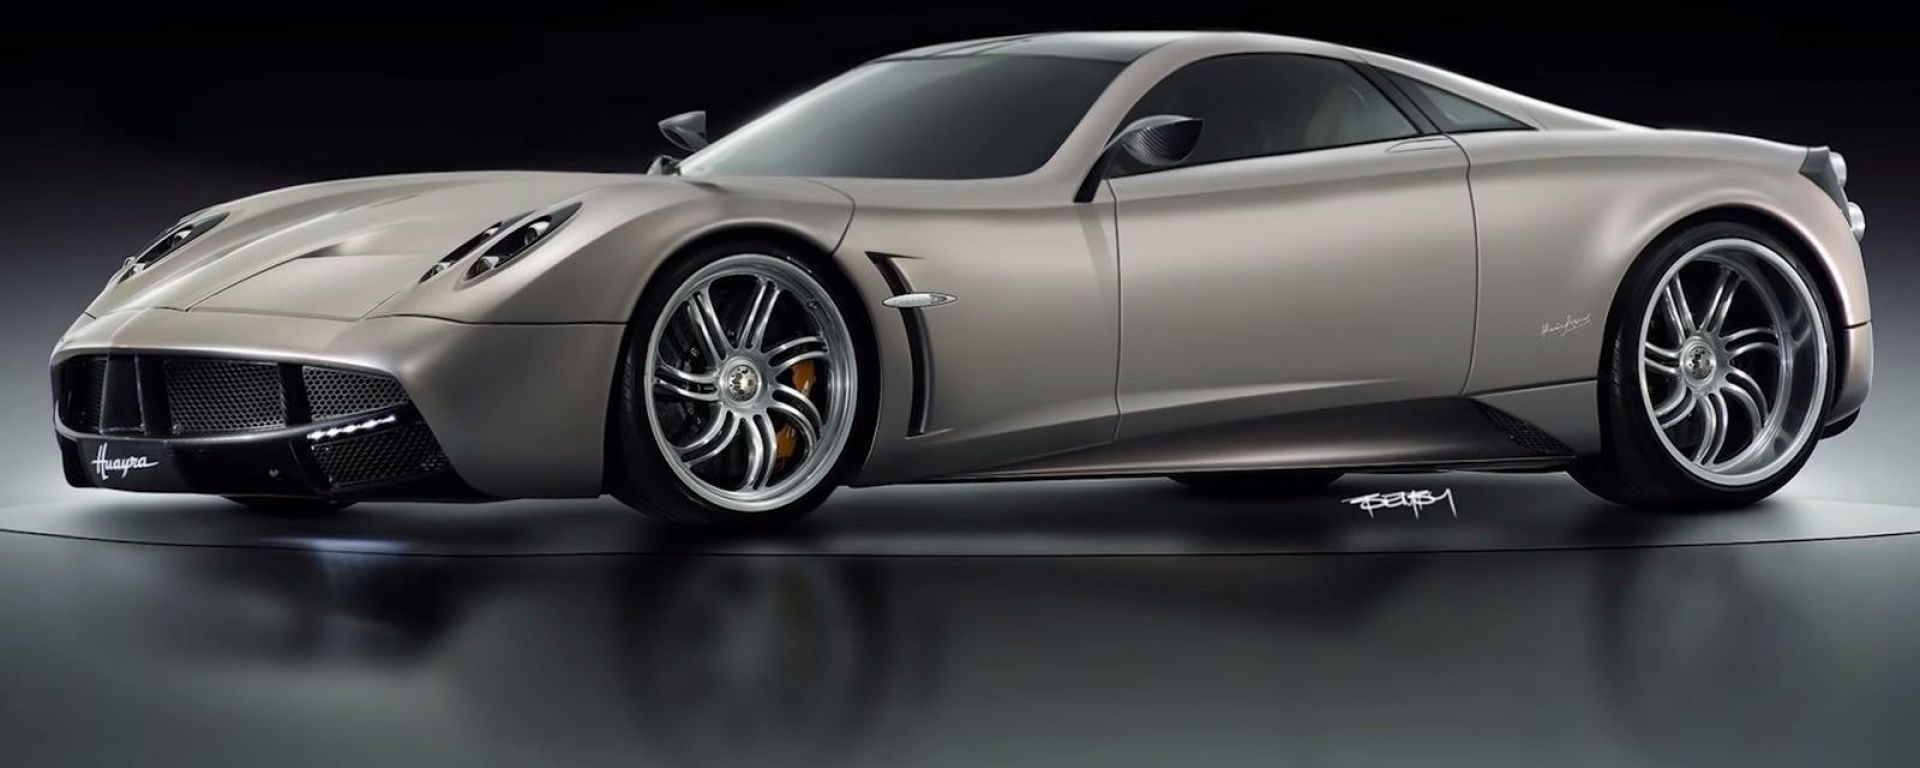 Pagani Huayra a motore anteriore: il rendering